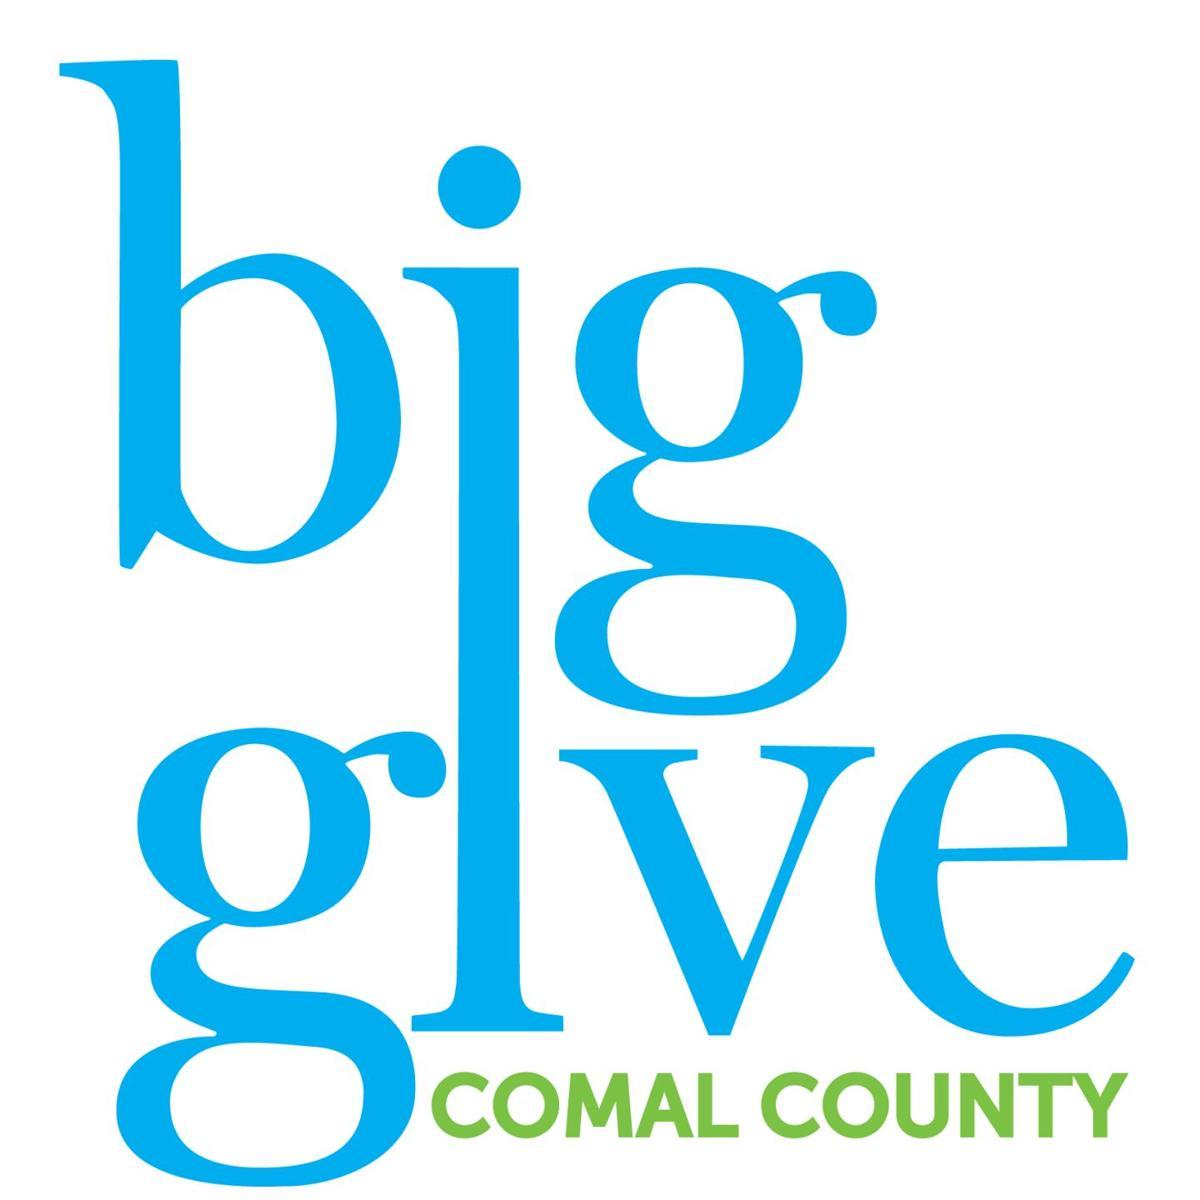 Big Give Comal County